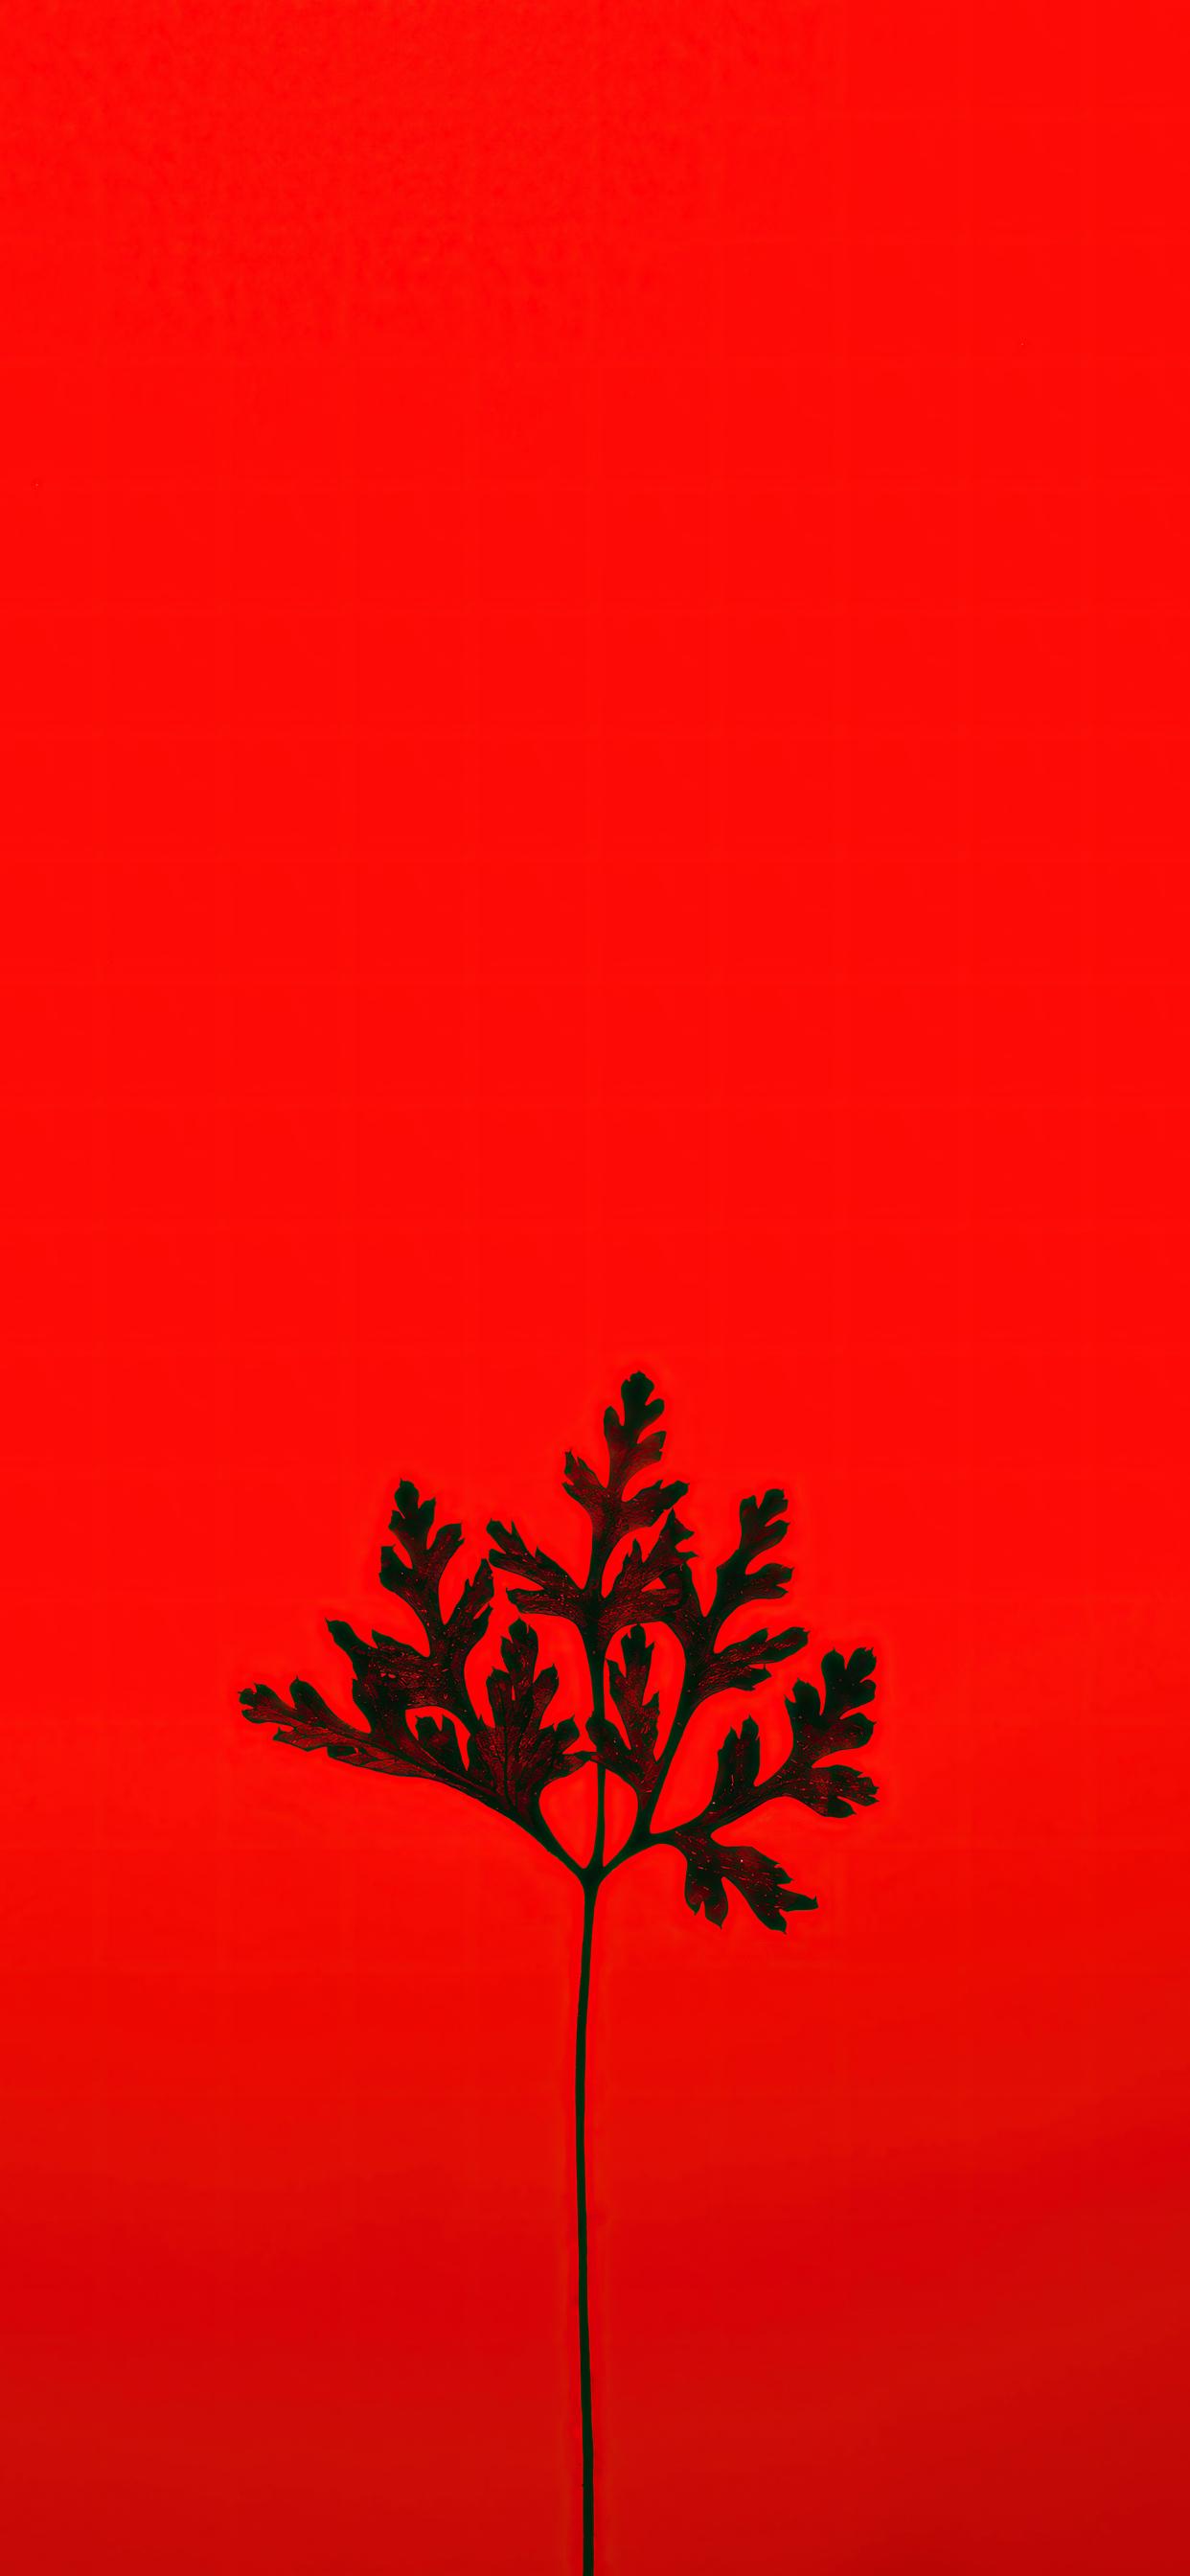 black-leaf-red-background-5k-bg.jpg